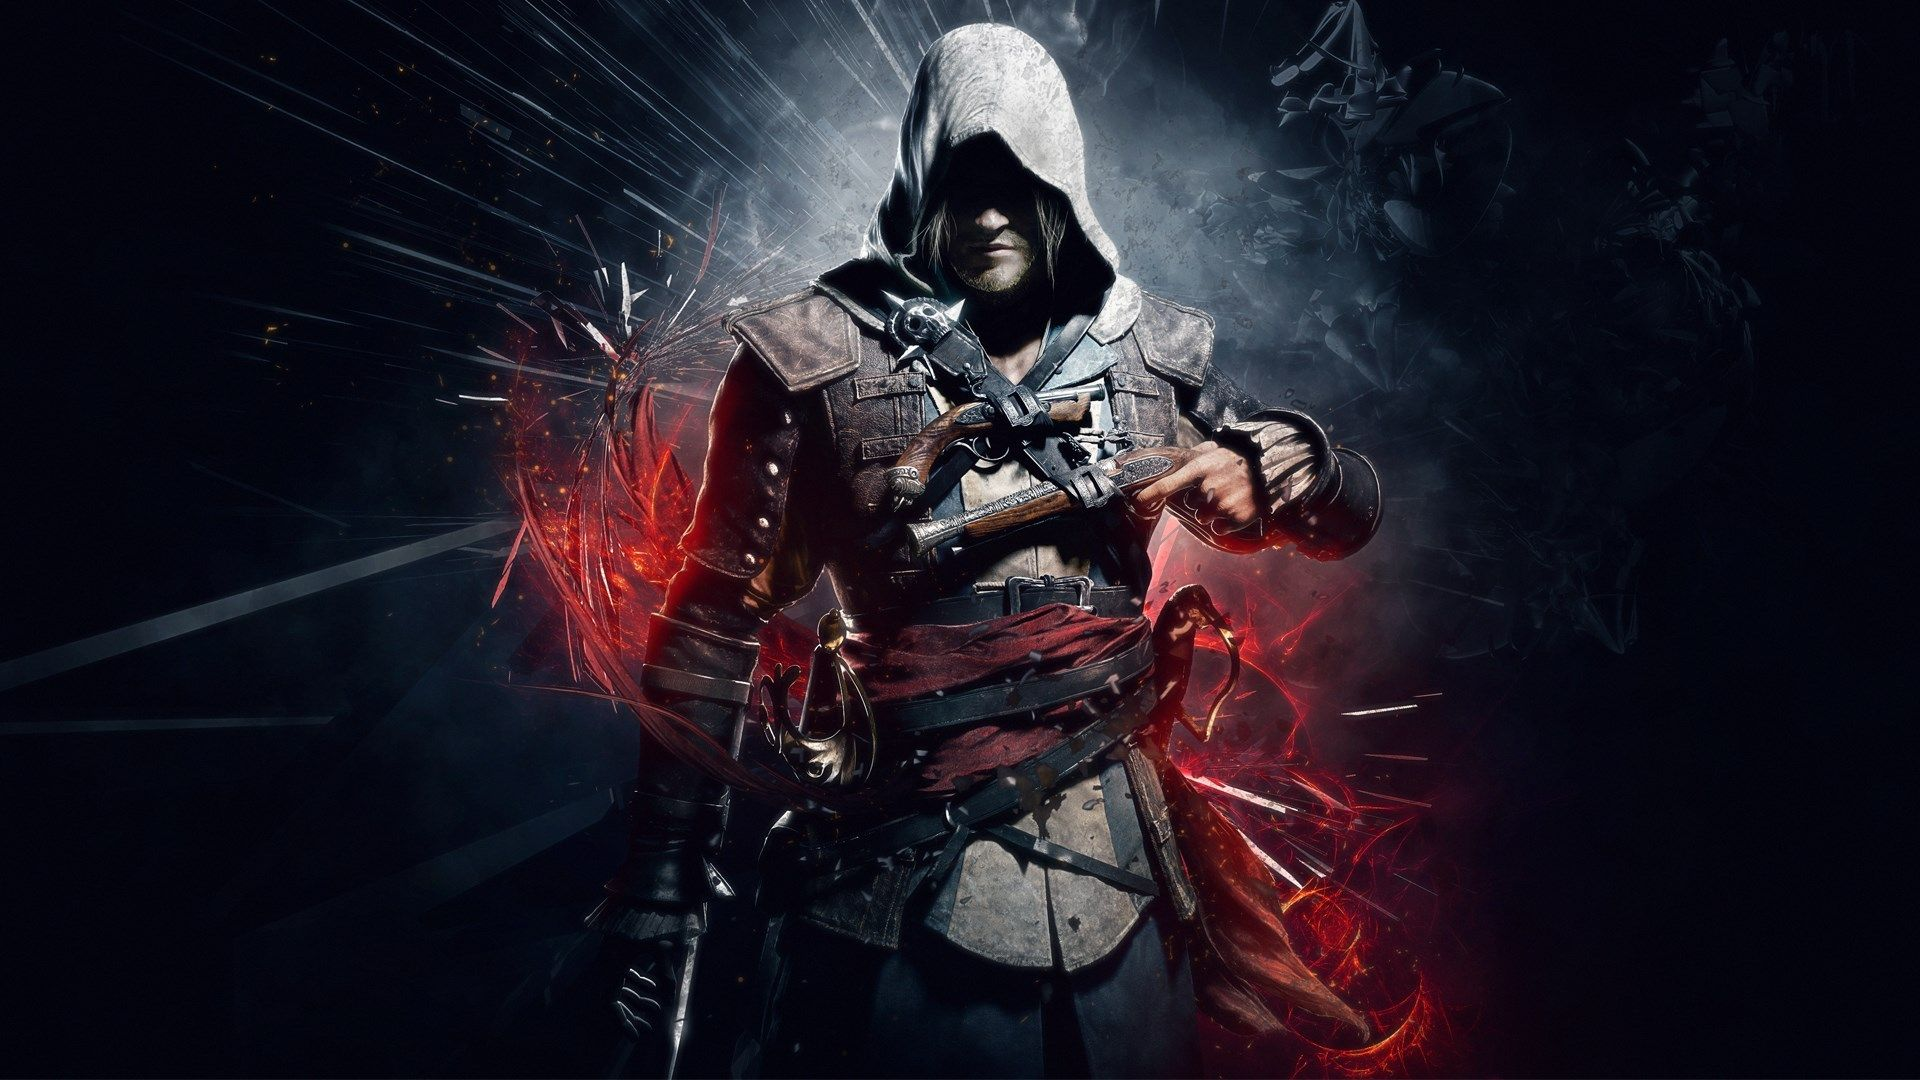 Assassin S Creed Desktop Wallpapers Top Free Assassin S Creed Desktop Backgrounds Wallpaperaccess